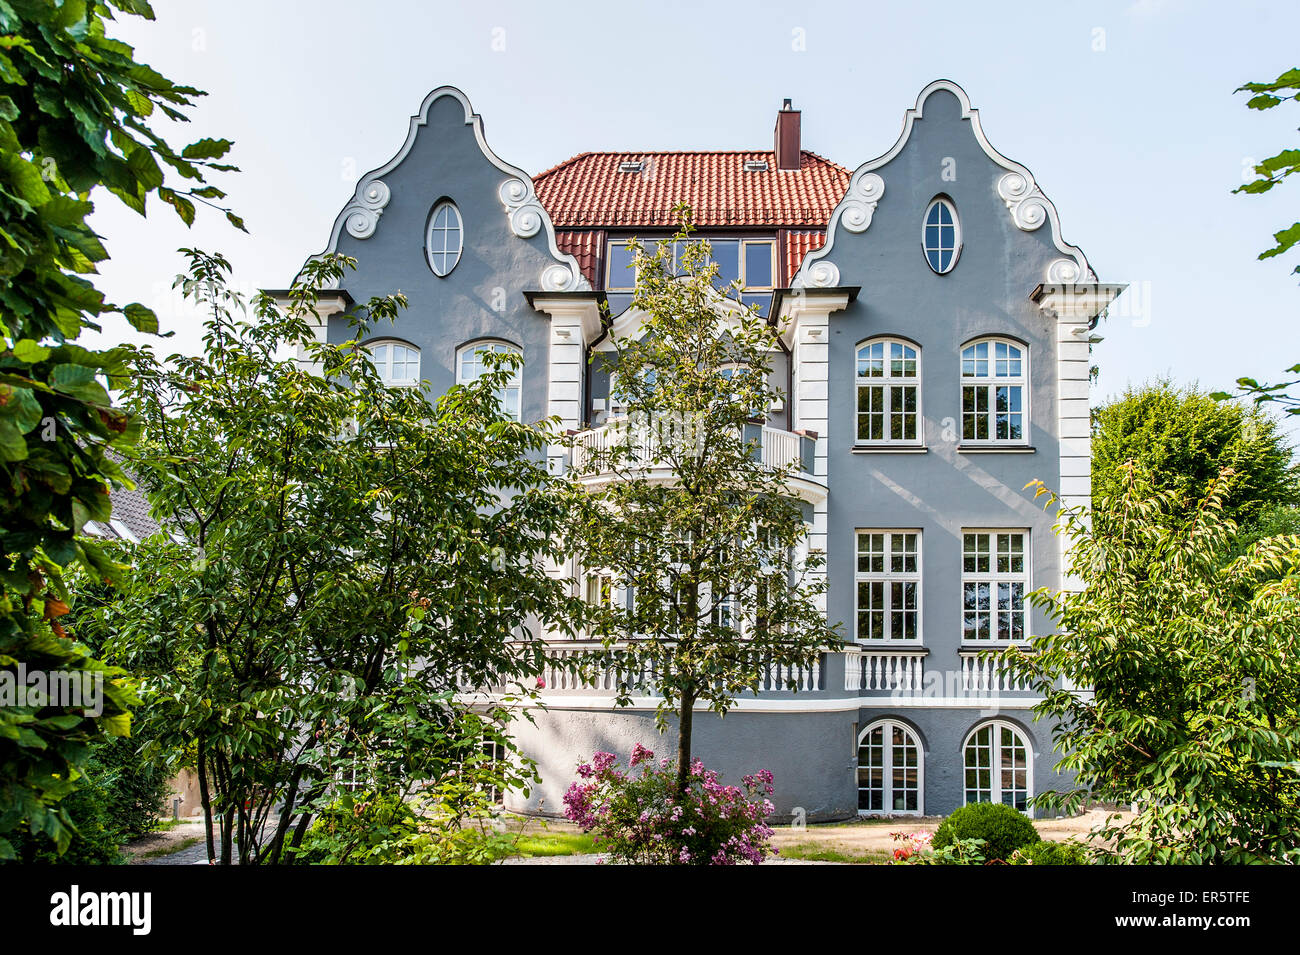 jugendstil villa hamburg deutschland stockfoto bild 83107570 alamy. Black Bedroom Furniture Sets. Home Design Ideas